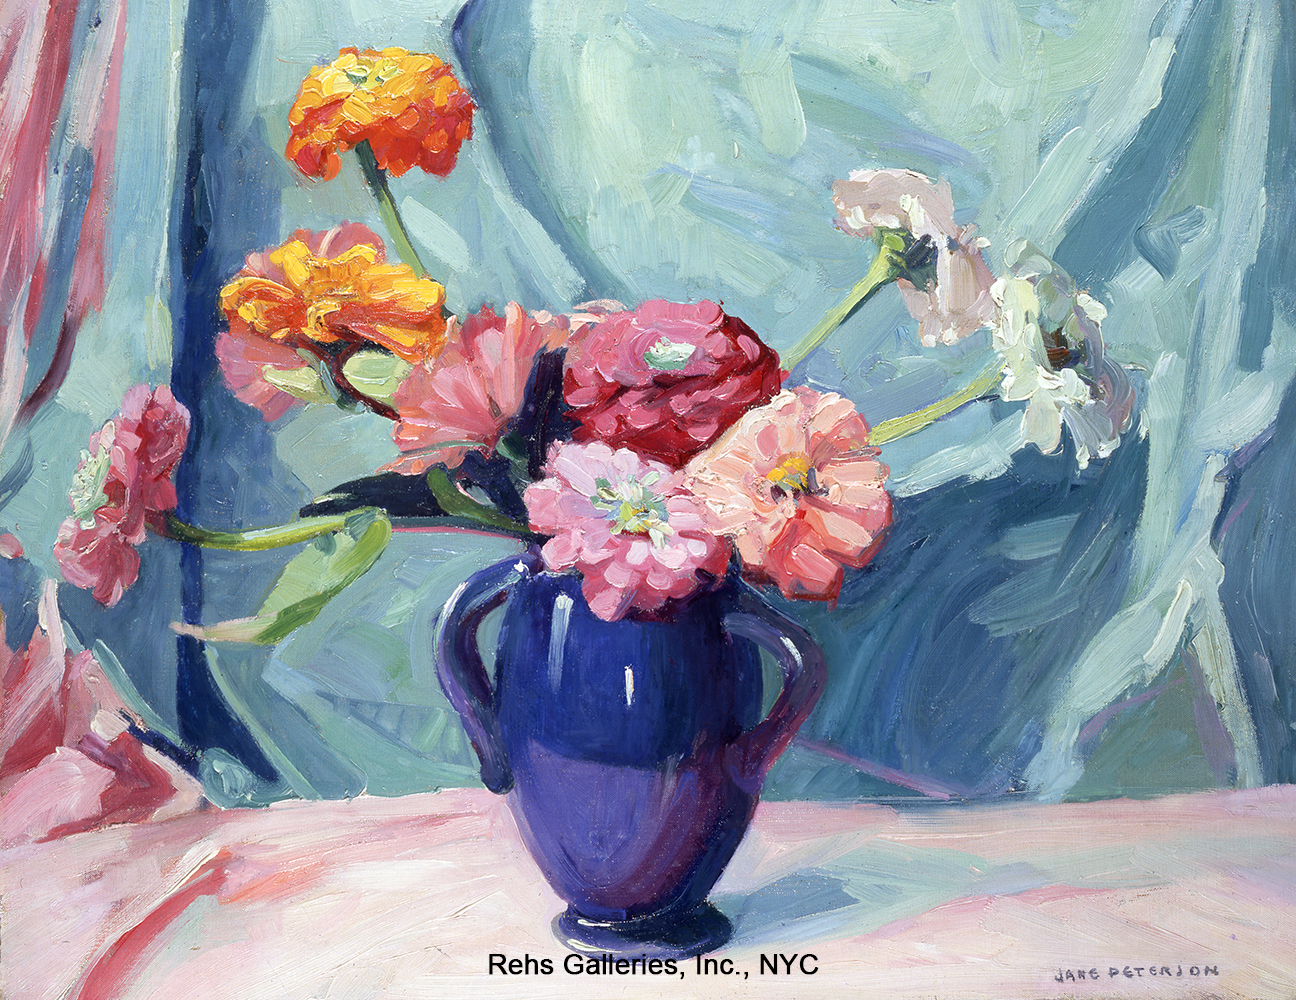 jane_peterson_a3277_flowers_in_a_blue_vase_wm.jpg